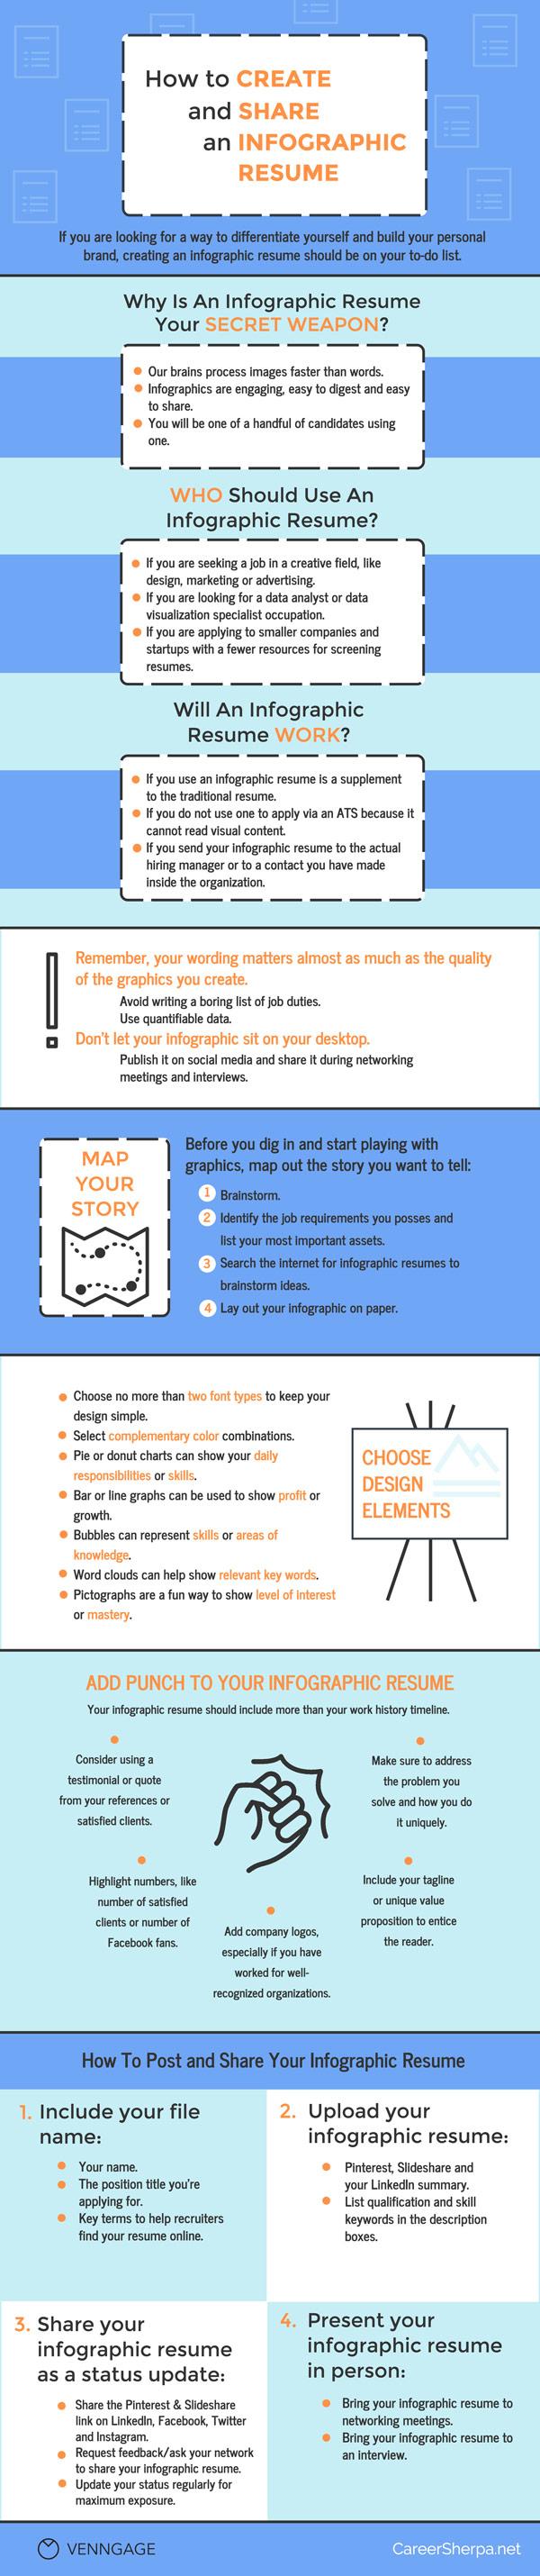 infographic-resume-comp